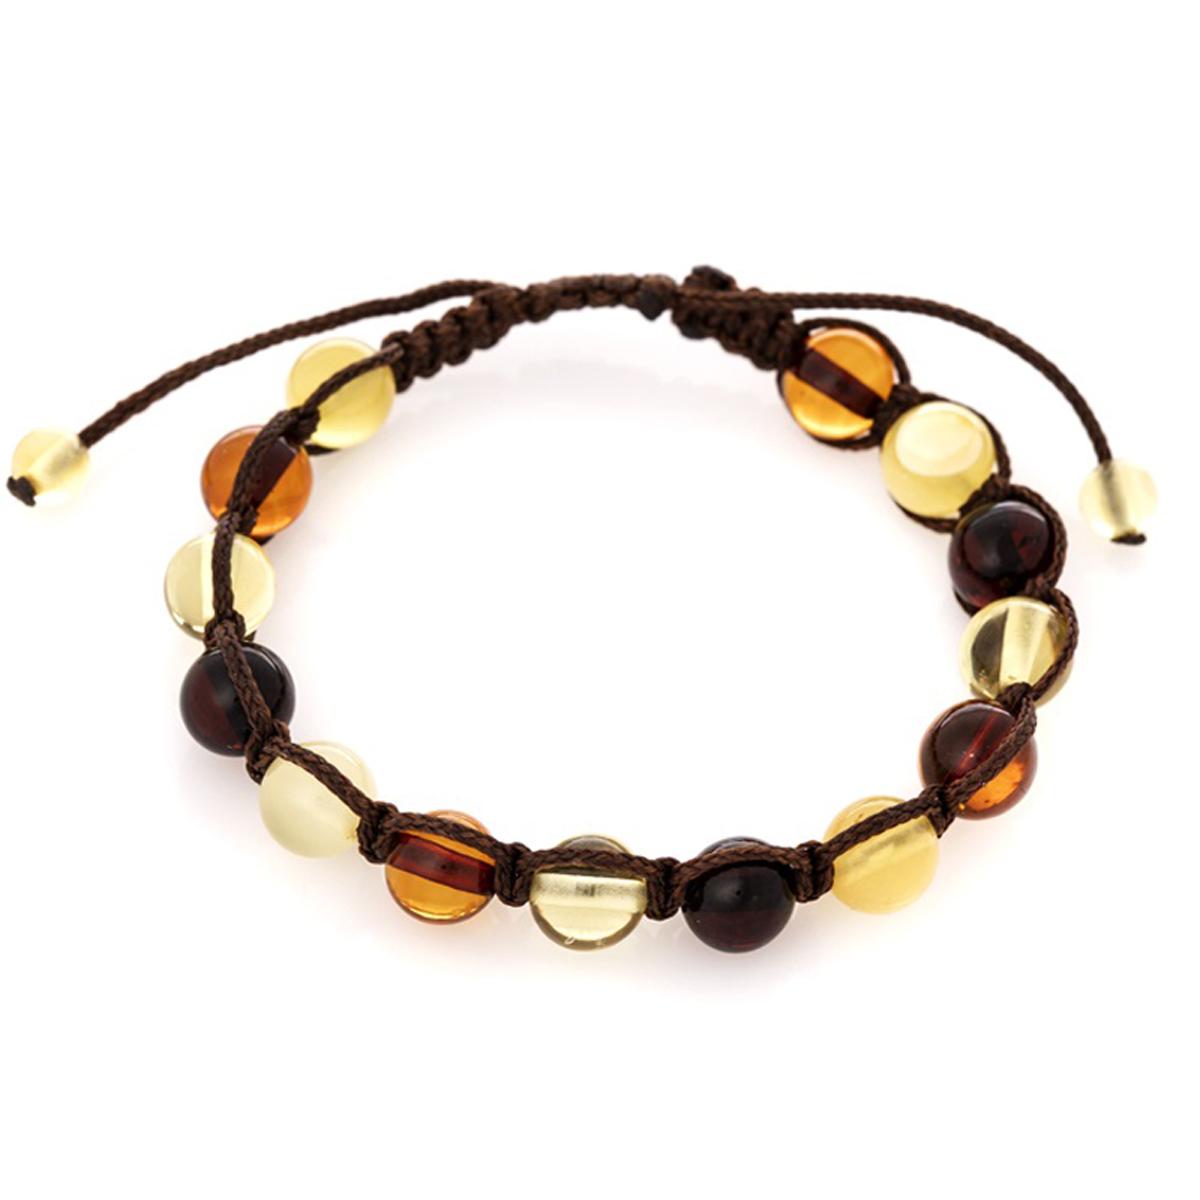 Bracelet artisanal \'Inspiration\' ambre 3 tons - 9 mm - [R3696]